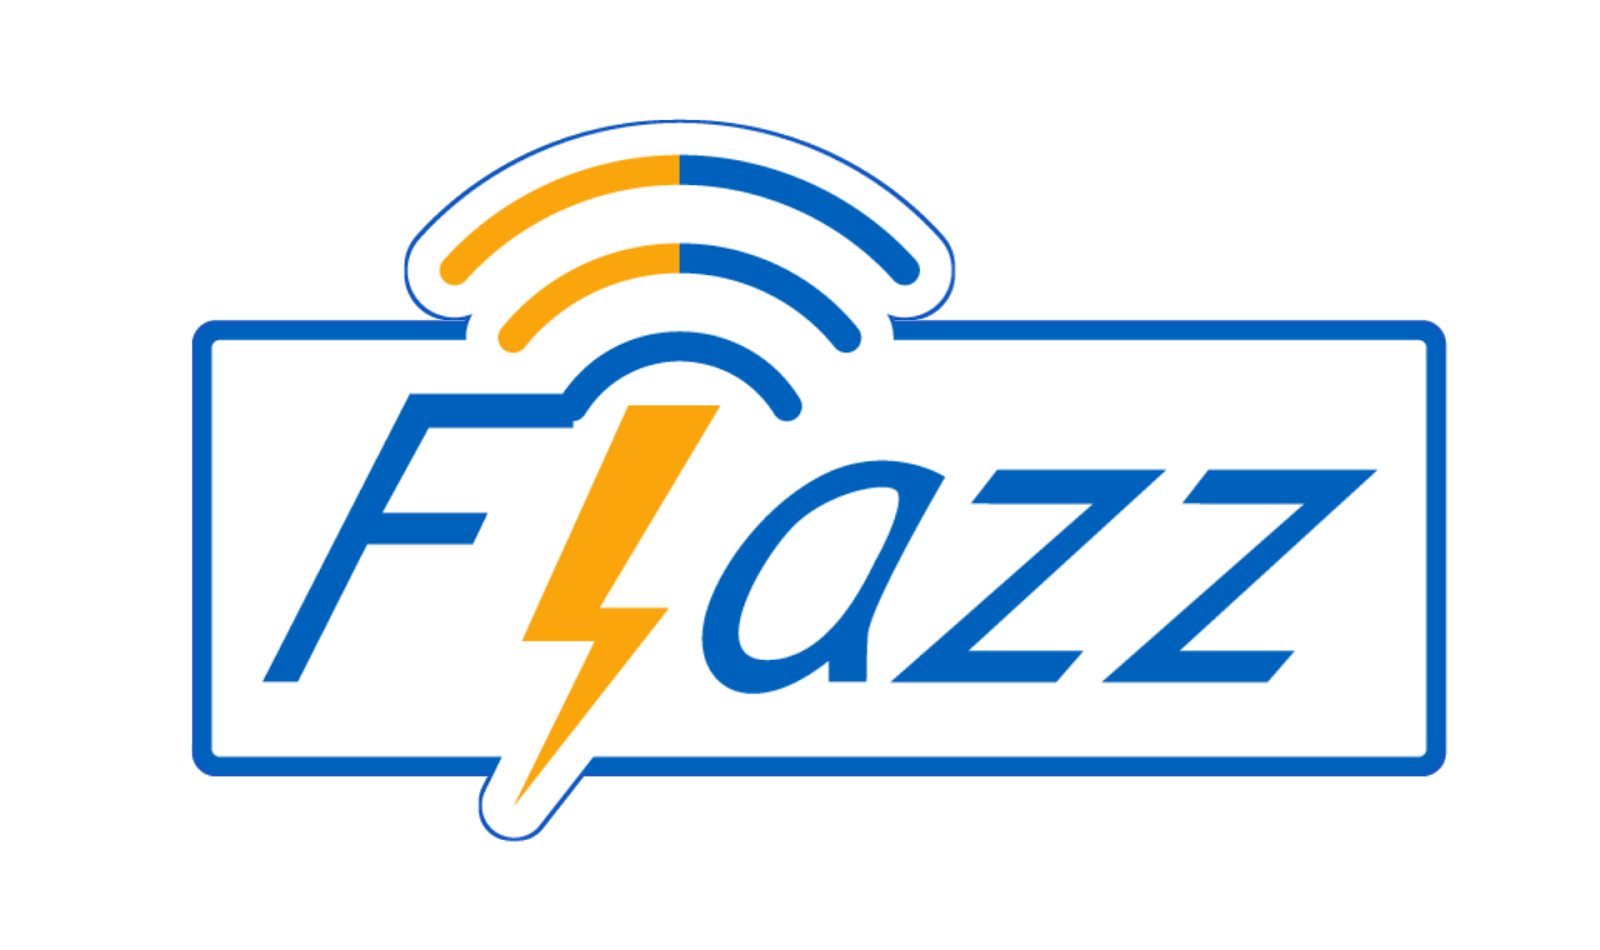 Logo Flazz Format PNG